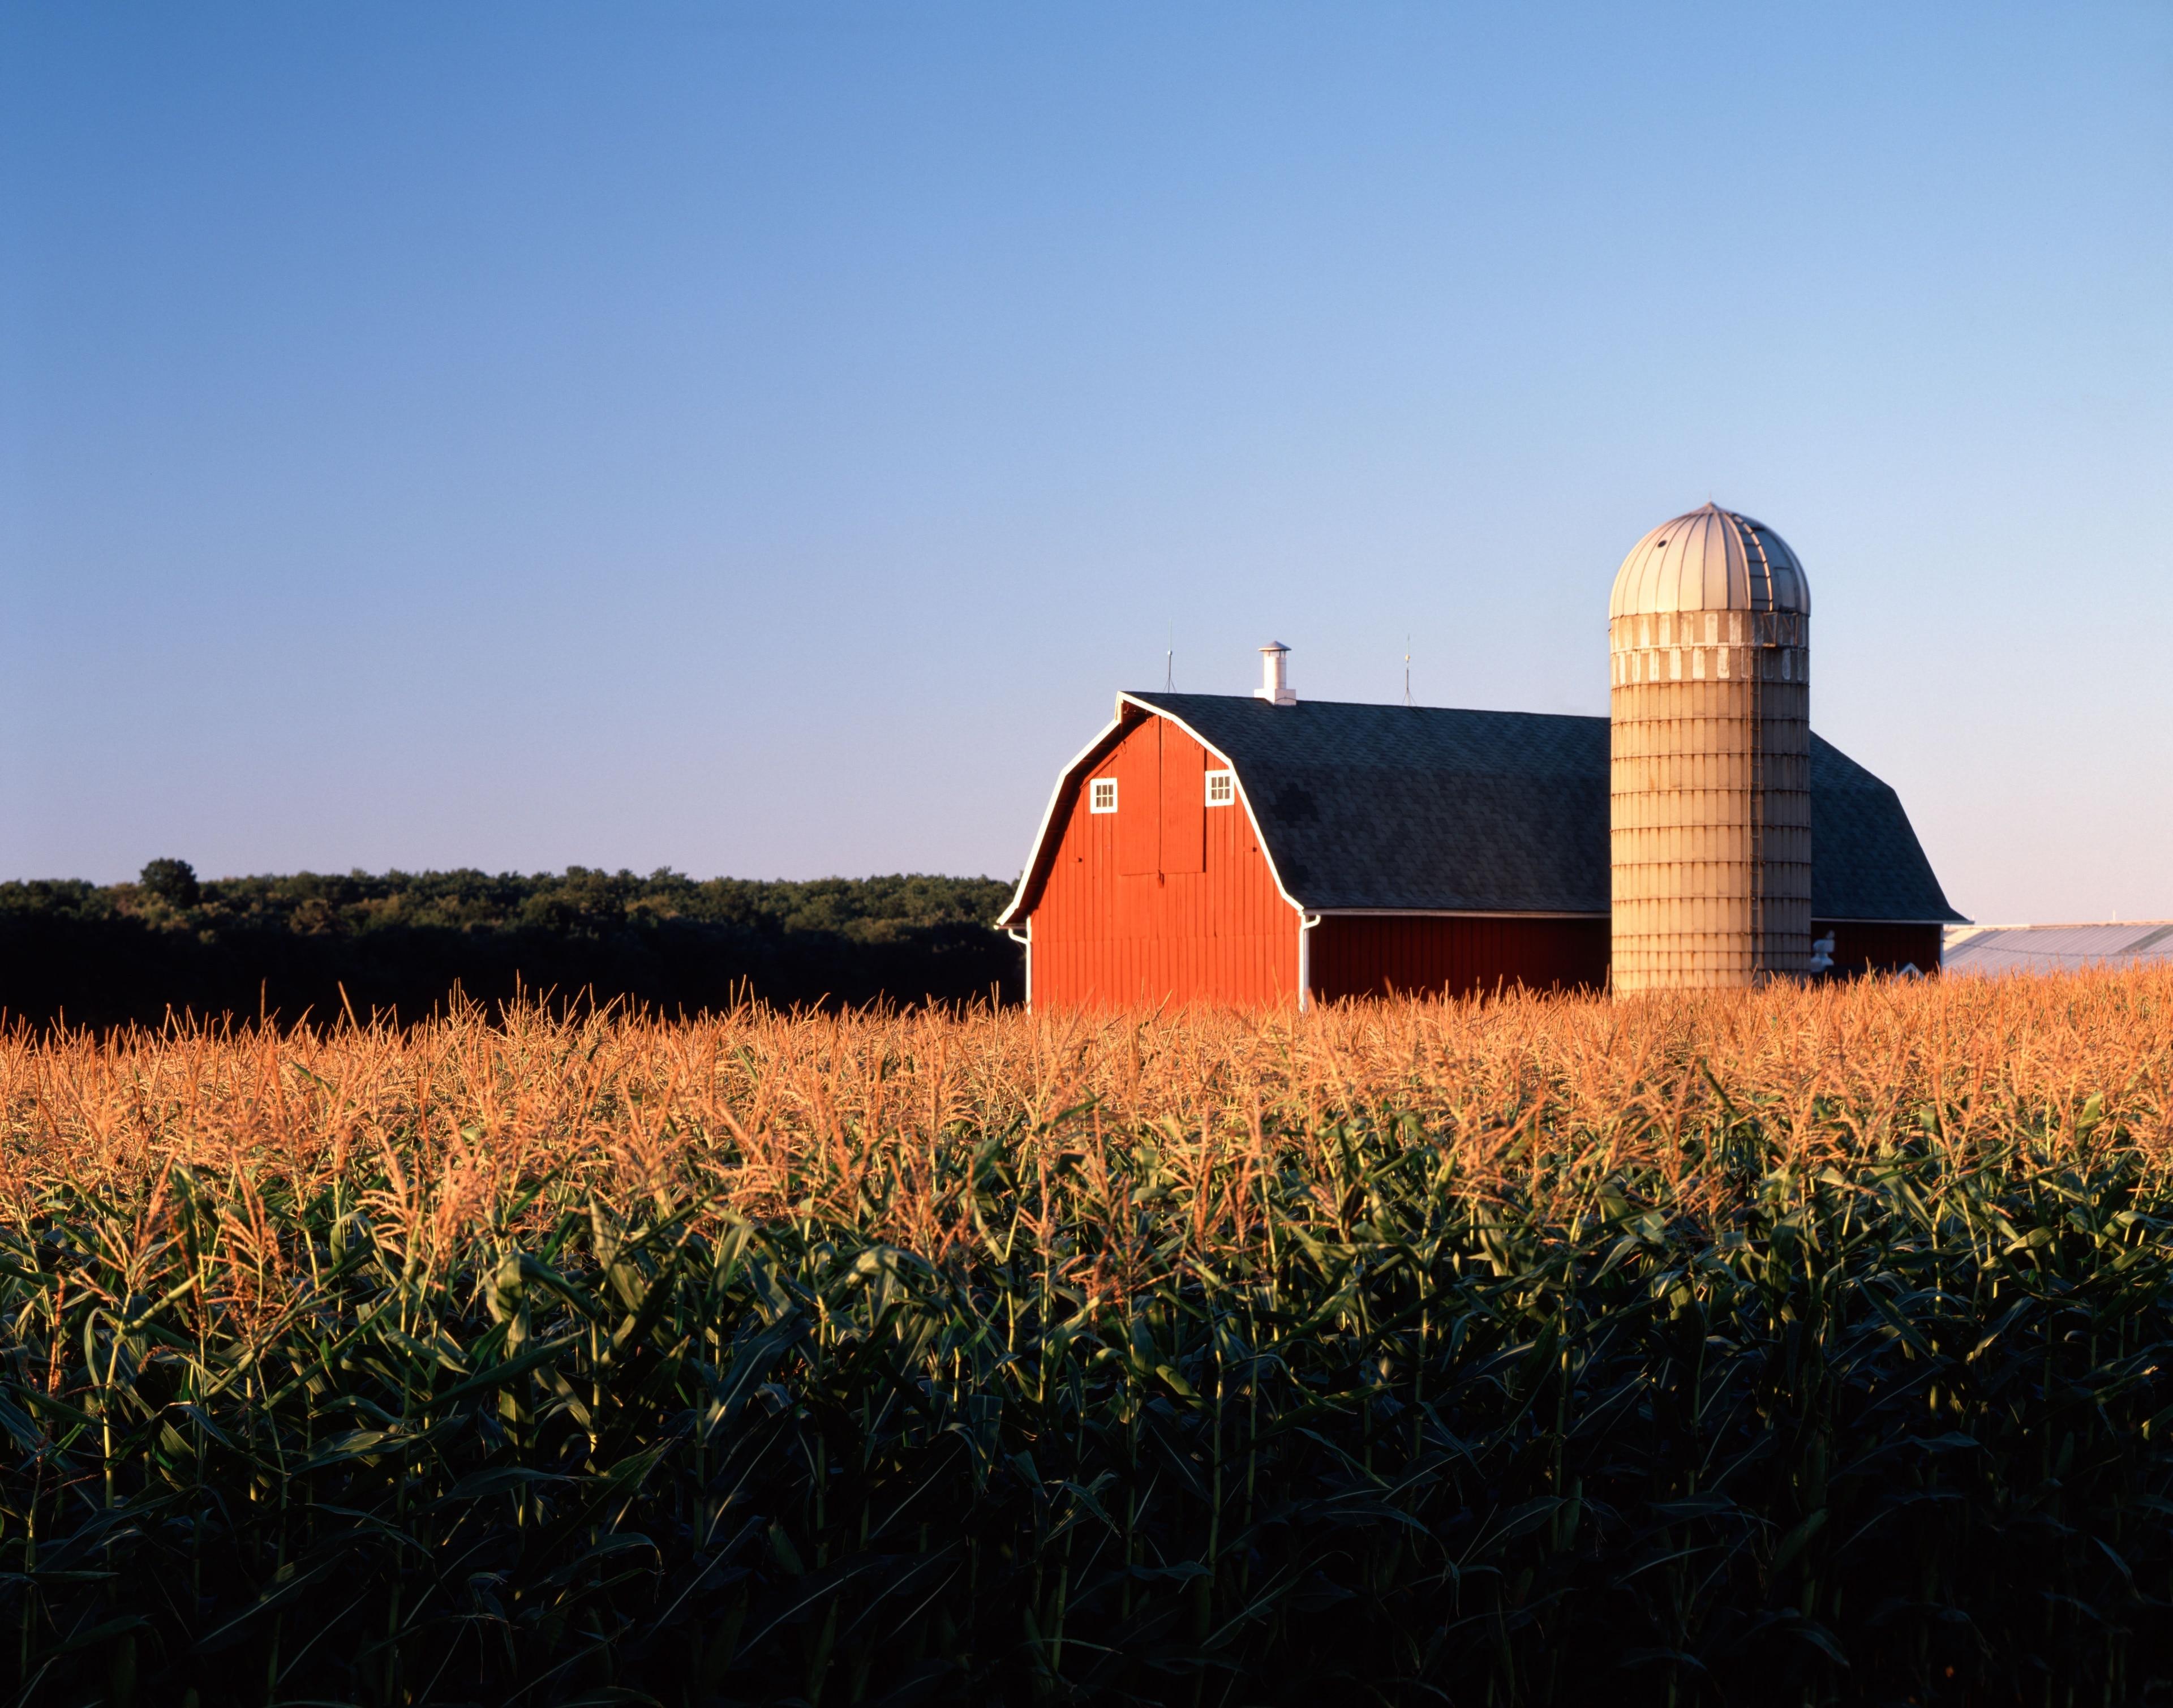 Delavan, Wisconsin, United States of America